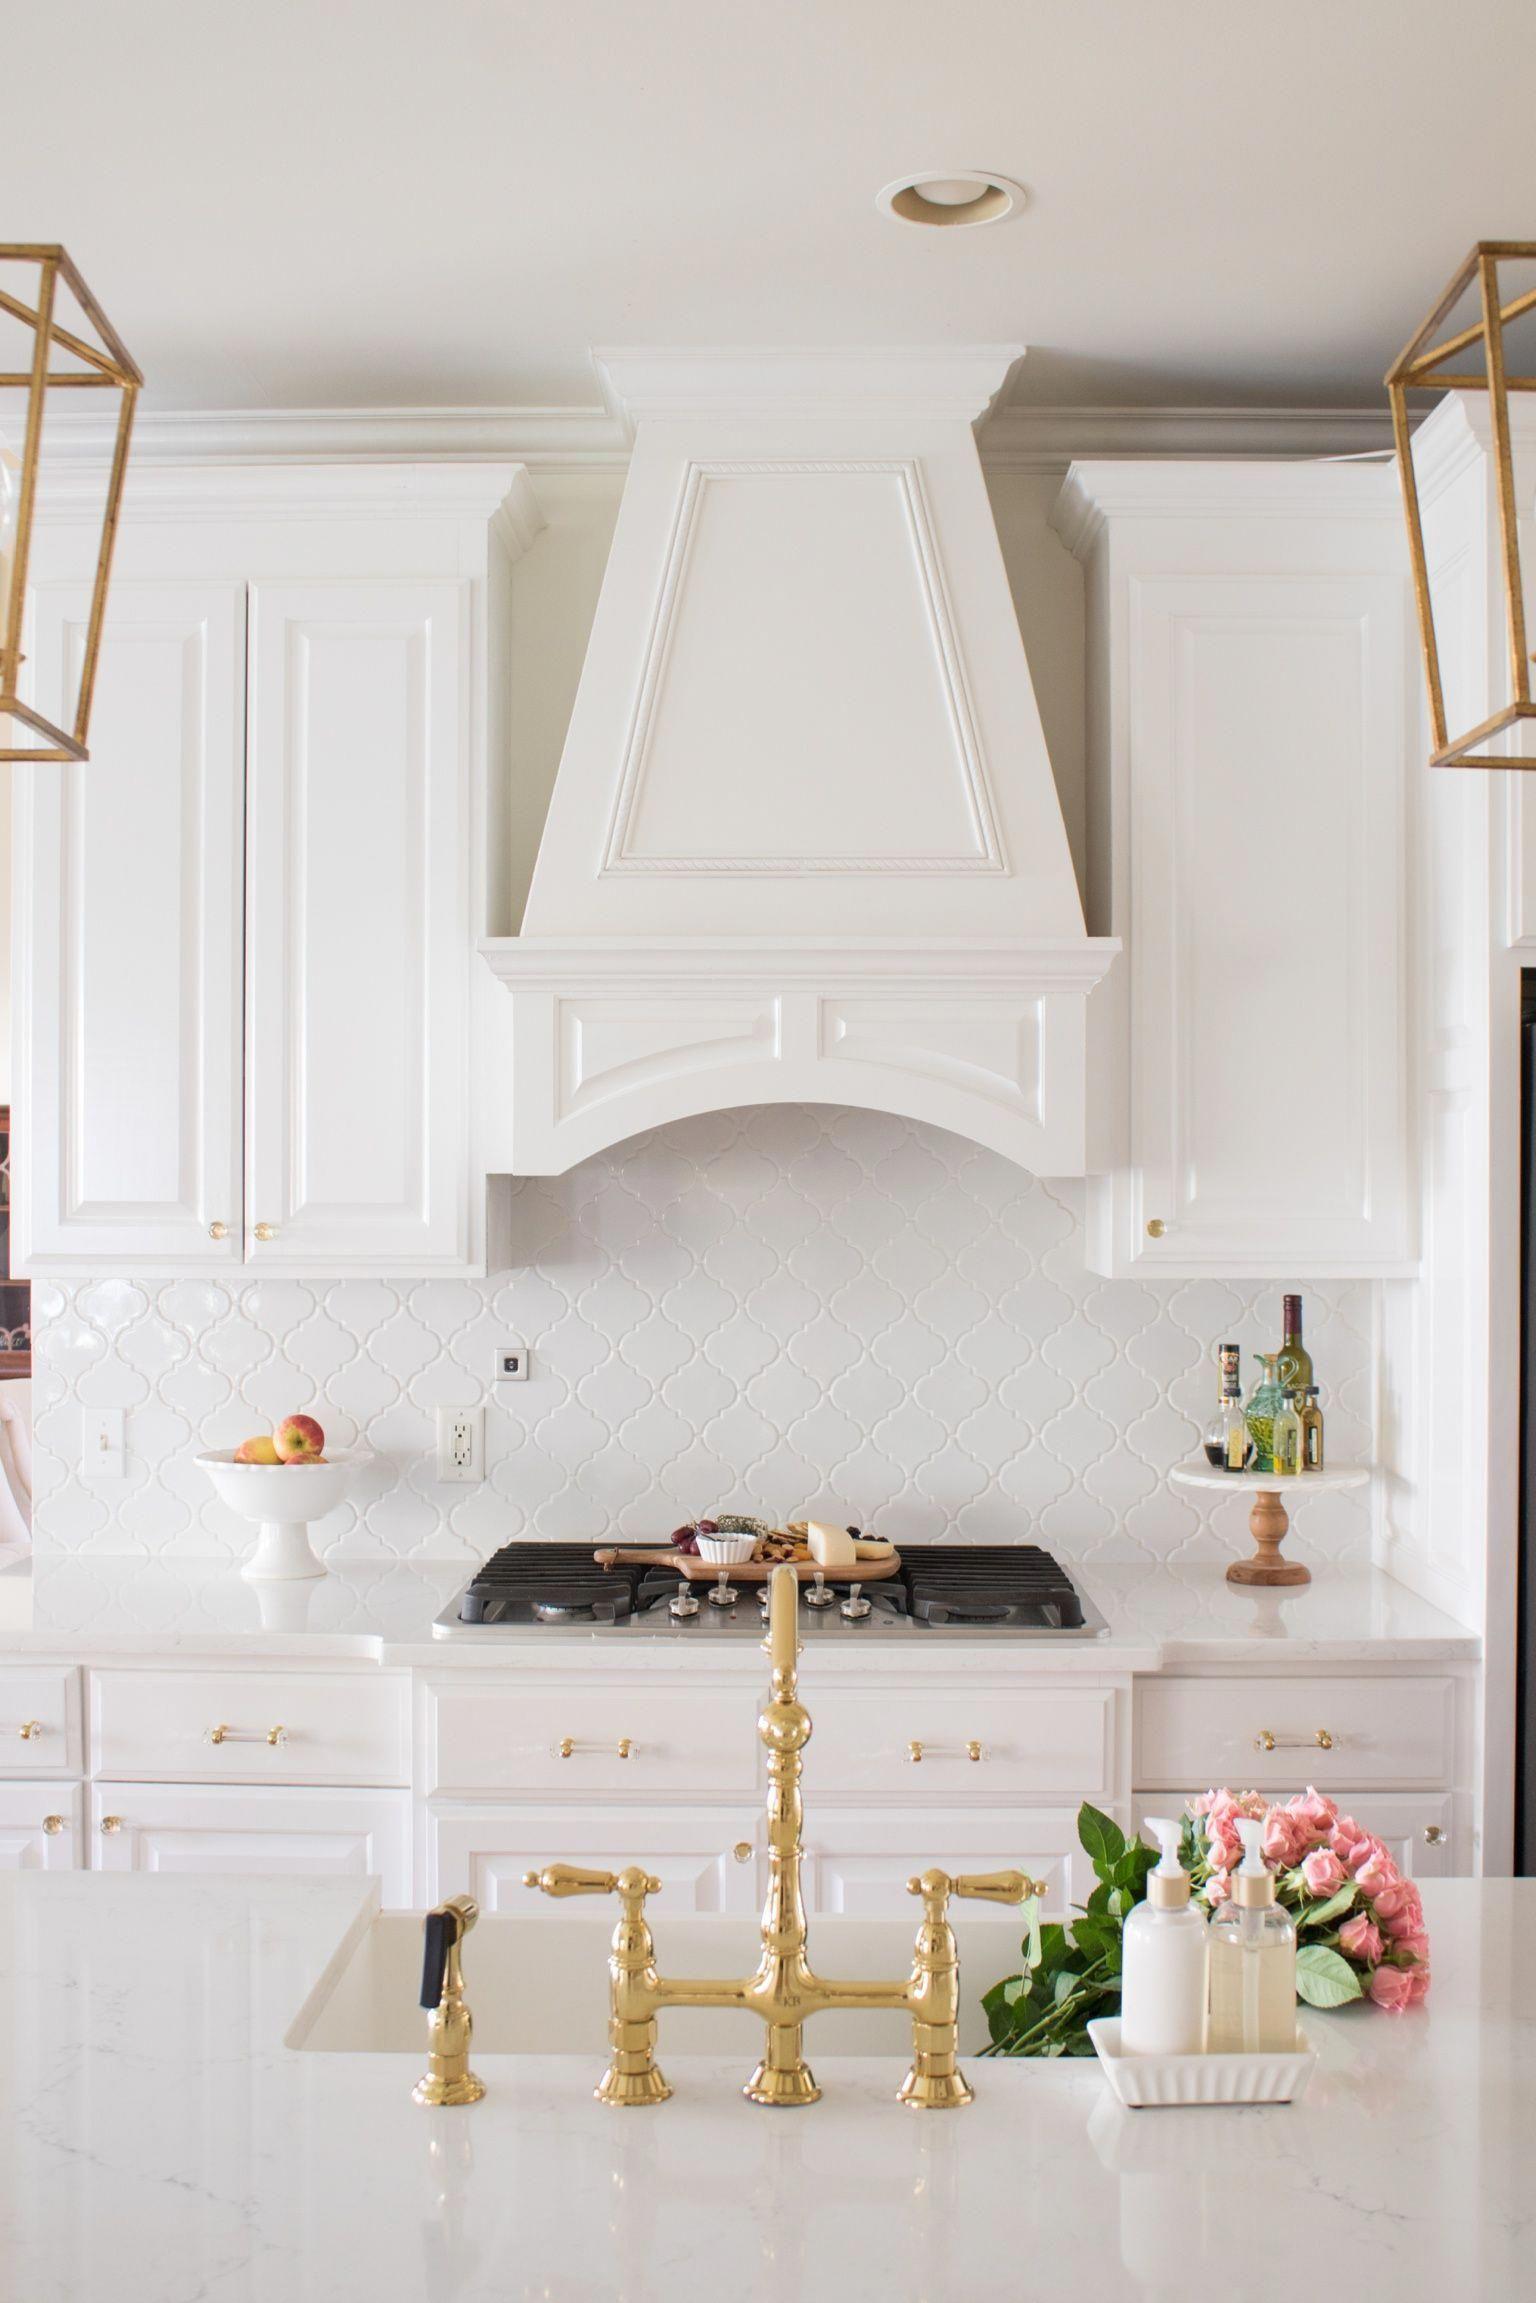 73 Small Modern White Kitchen Ideas White Kitchen Remodeling Kitchen Remodel